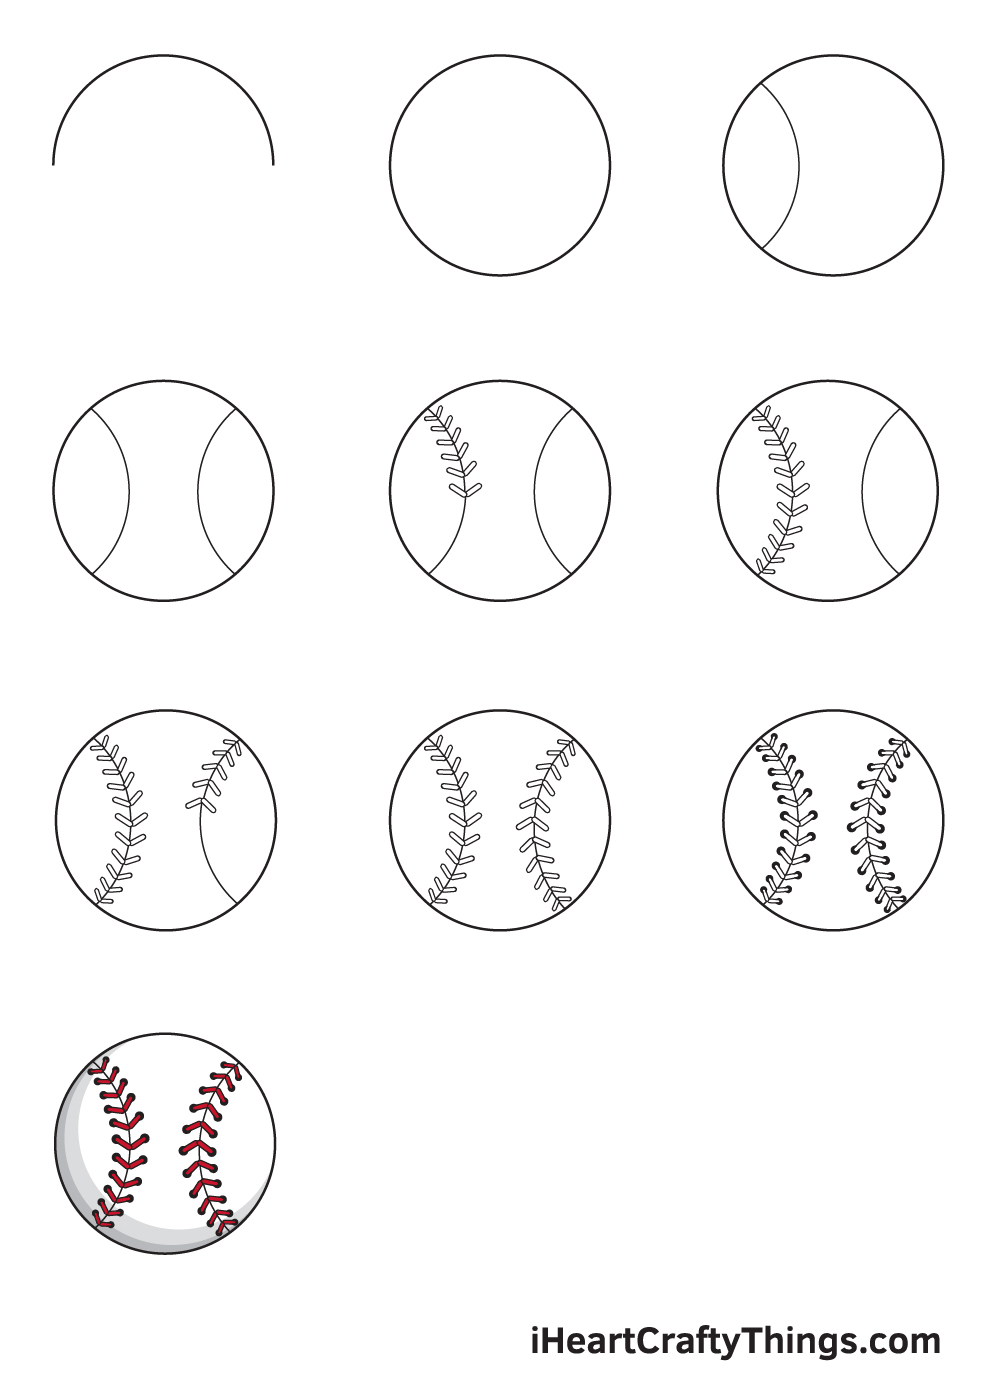 drawing baseball in 9 easy steps